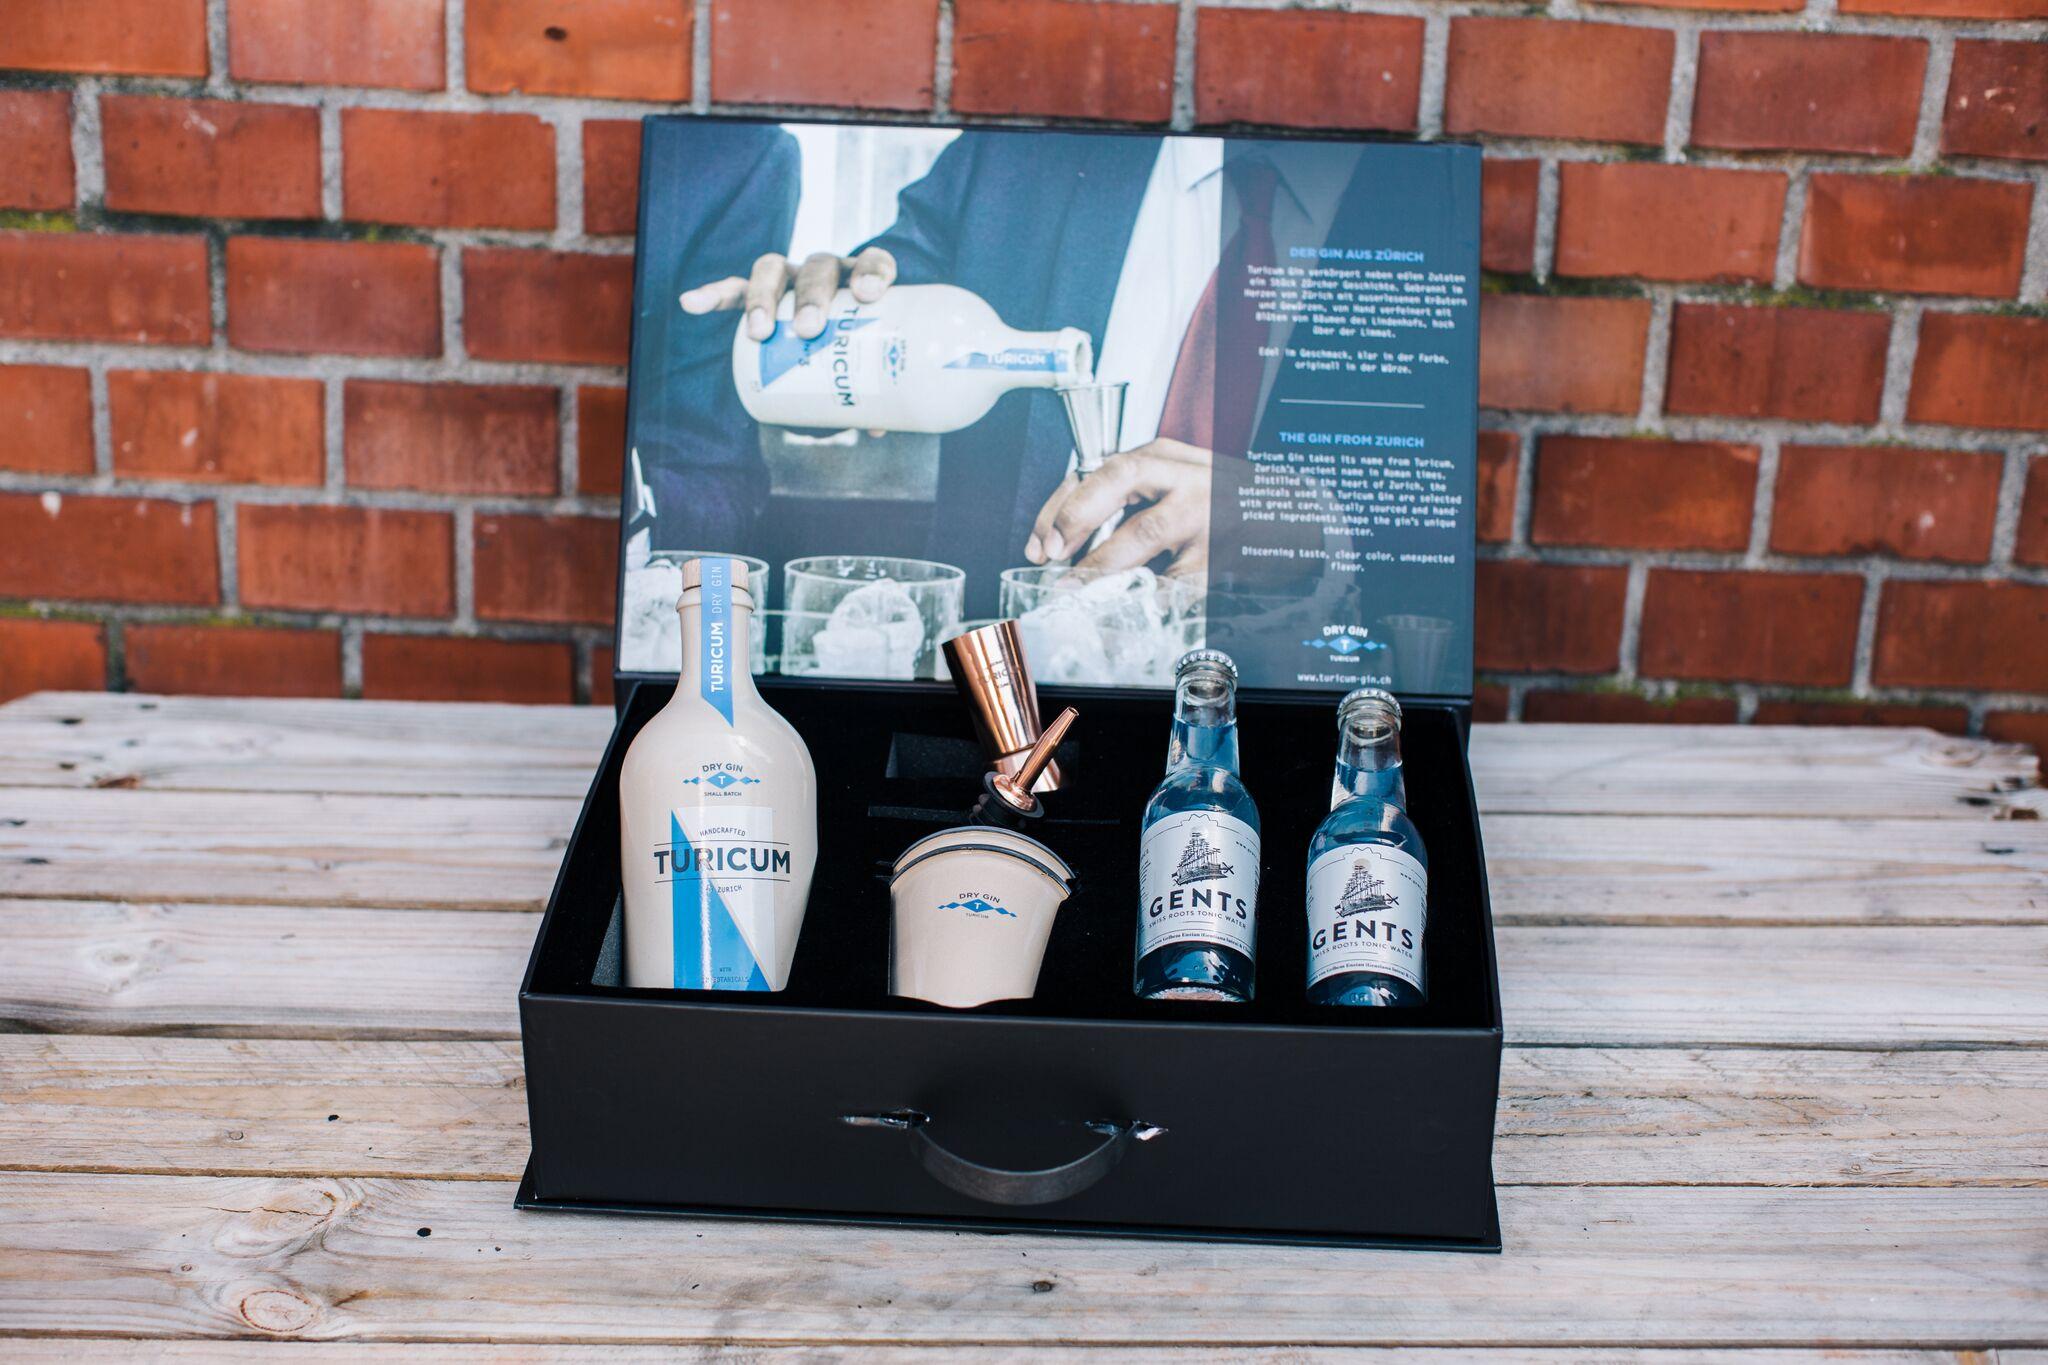 Turicum Gin Lab Box by Sandra Marusic Photography